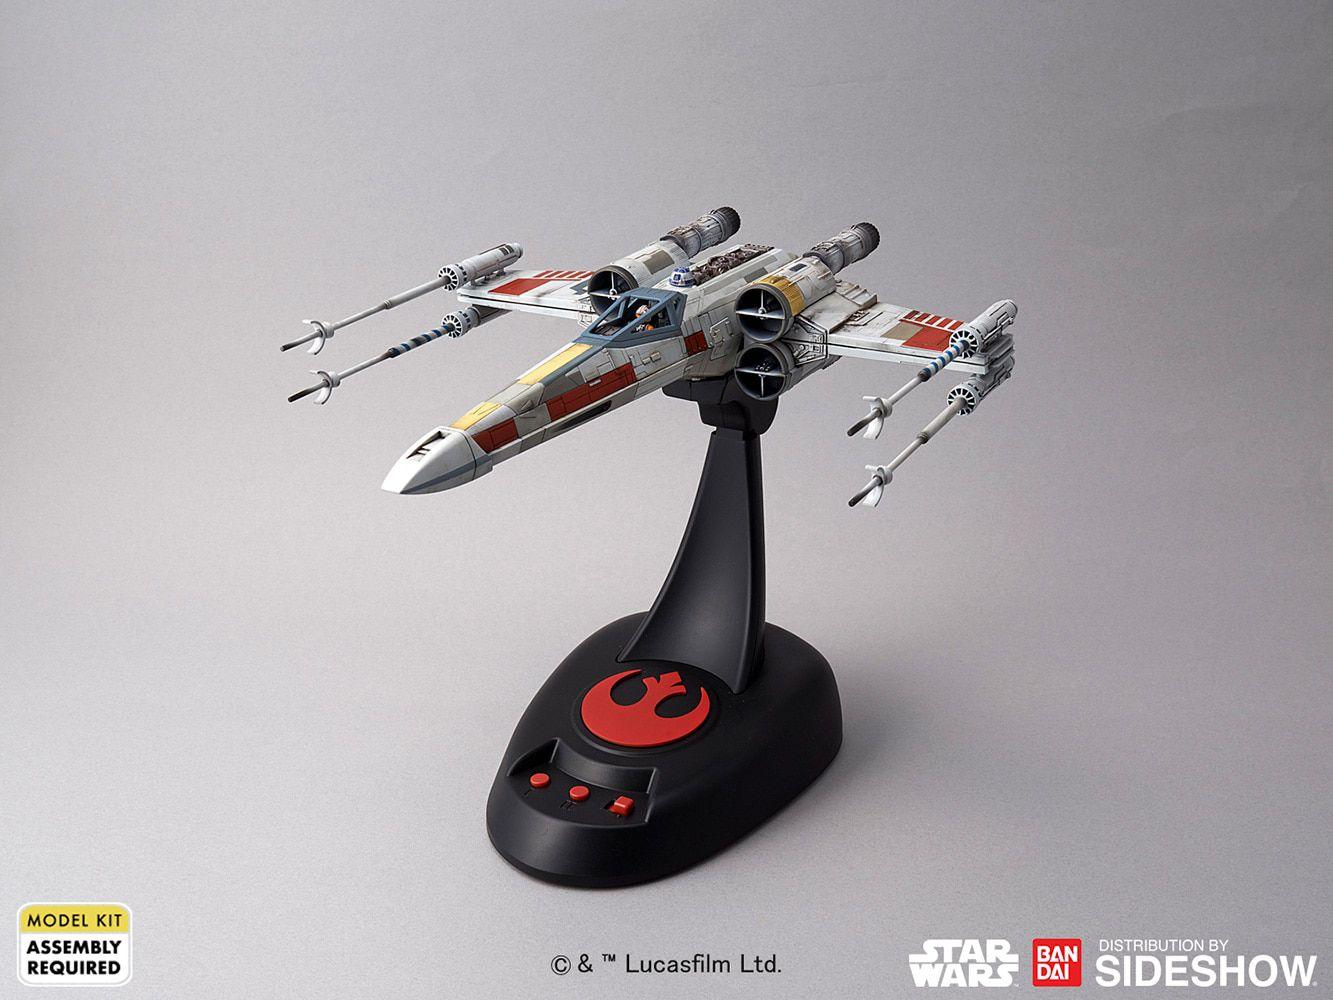 PRÉ VENDA Model Kit X-Wing Starfighter Moving Edition: Star Wars - Bandai